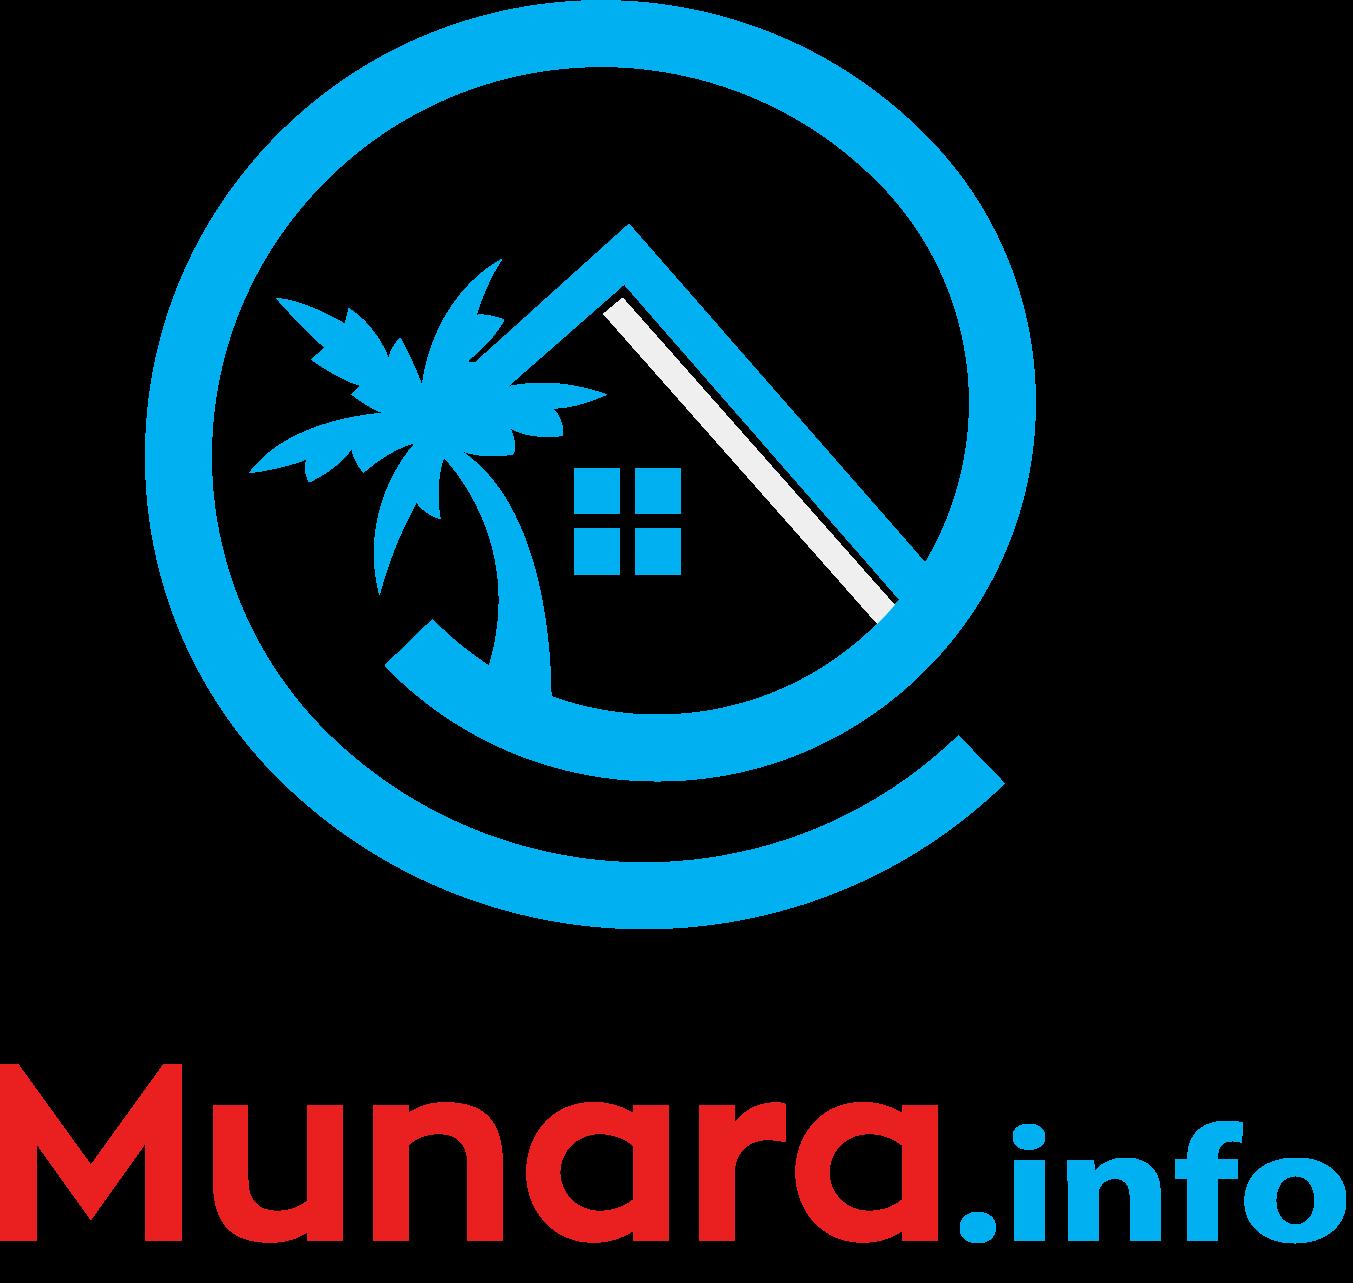 Munara.info